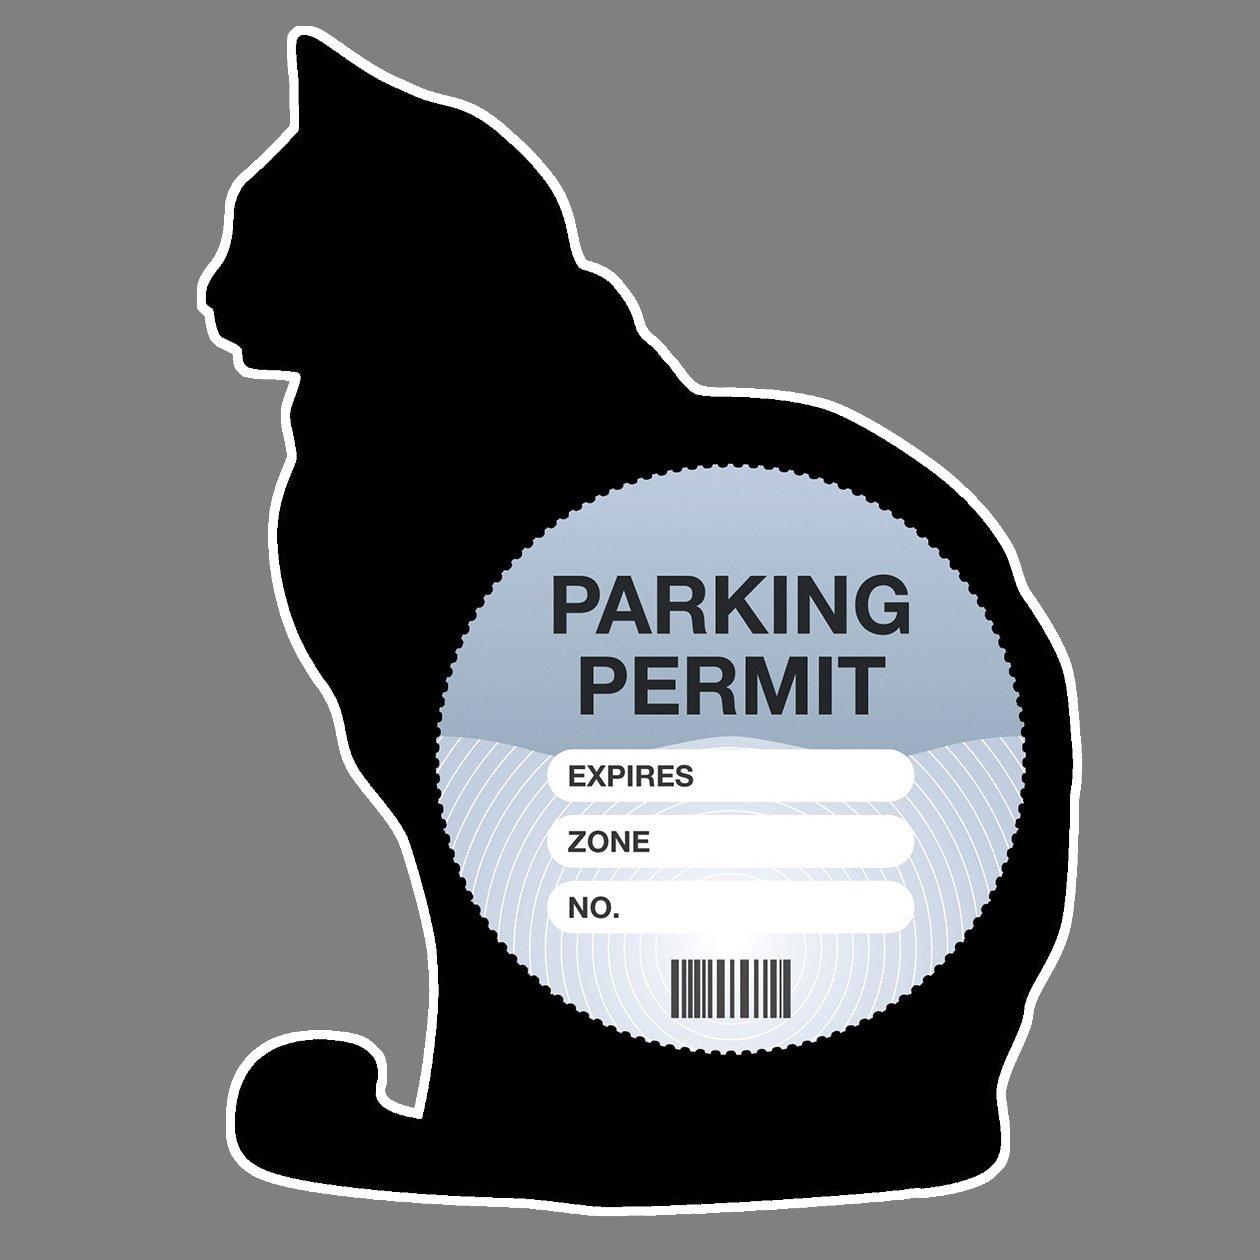 Parking Permit Holder Skin Black Cat Kitten Silhouette - Free UK Postage Artisticky